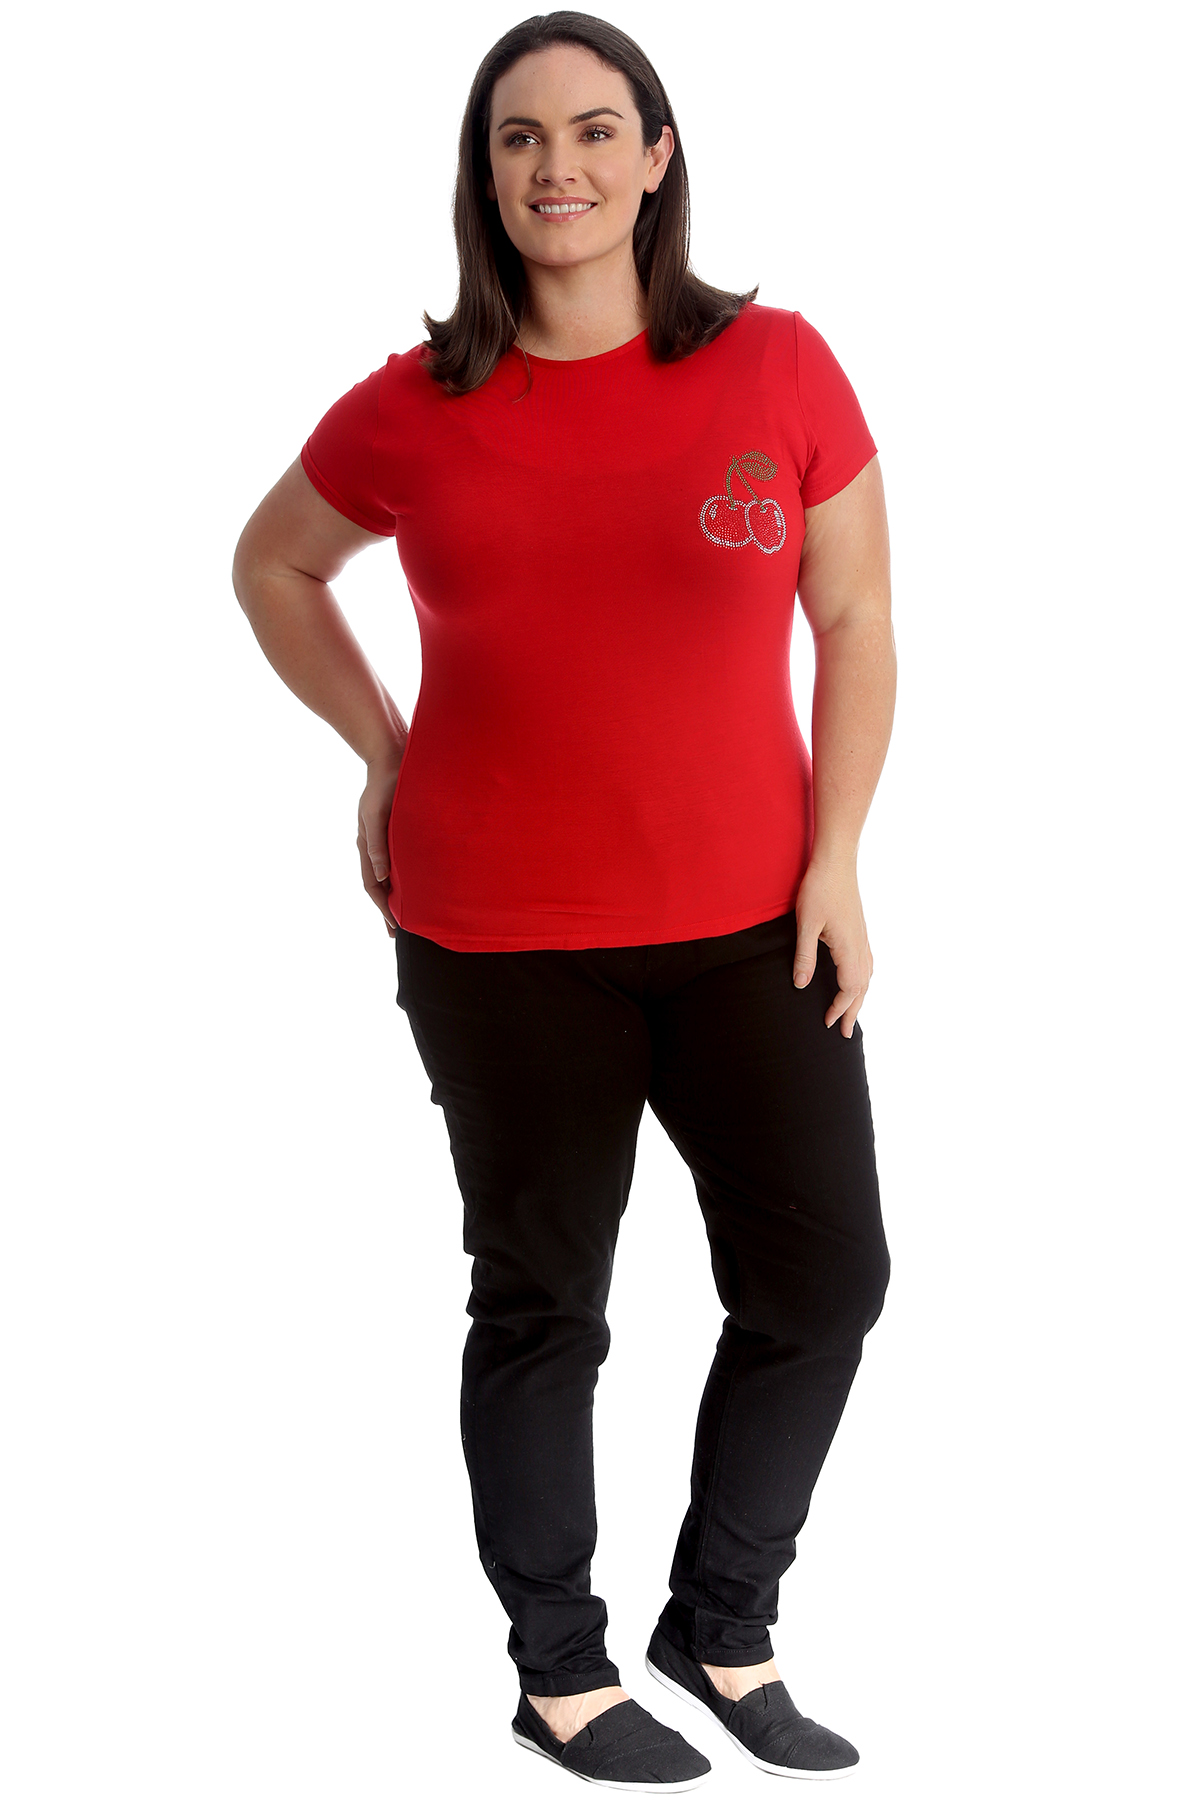 New-Womens-Plus-Size-Top-Ladies-Cherry-Rhinestone-T-Shirt-Soft-Stud-Shiny-Hip thumbnail 12